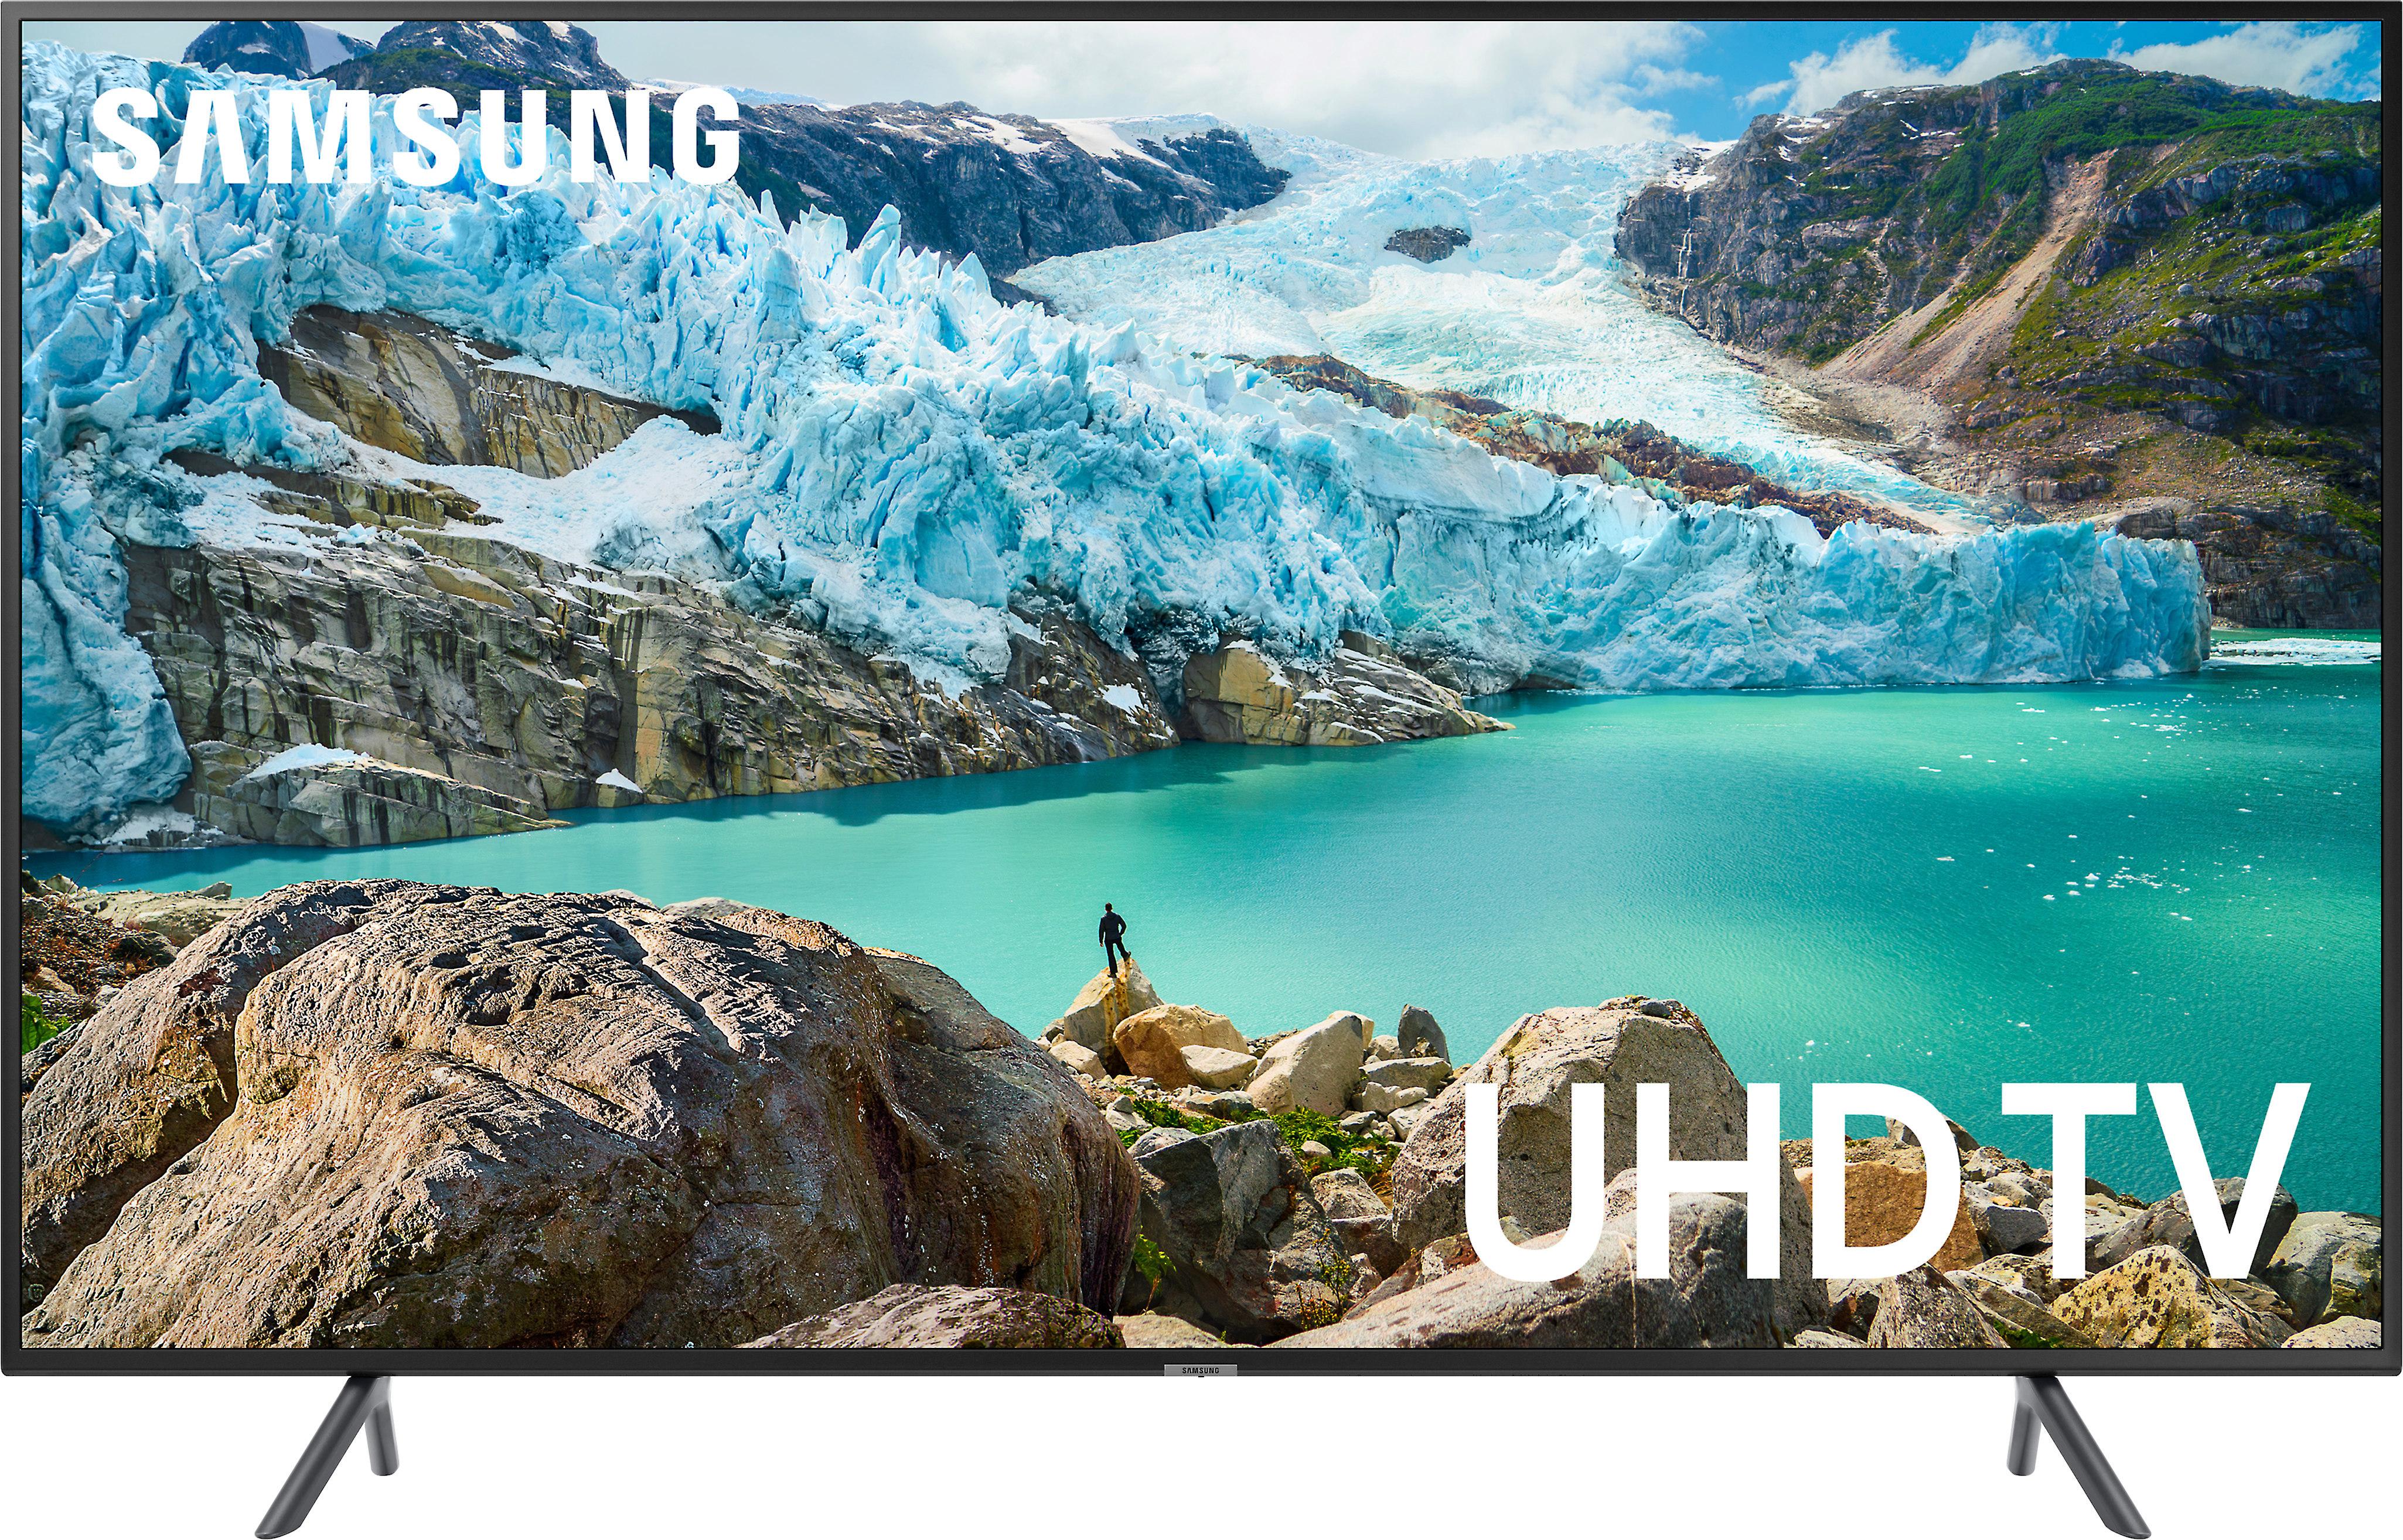 Samsung 4K Ultra HD TVs at Crutchfield